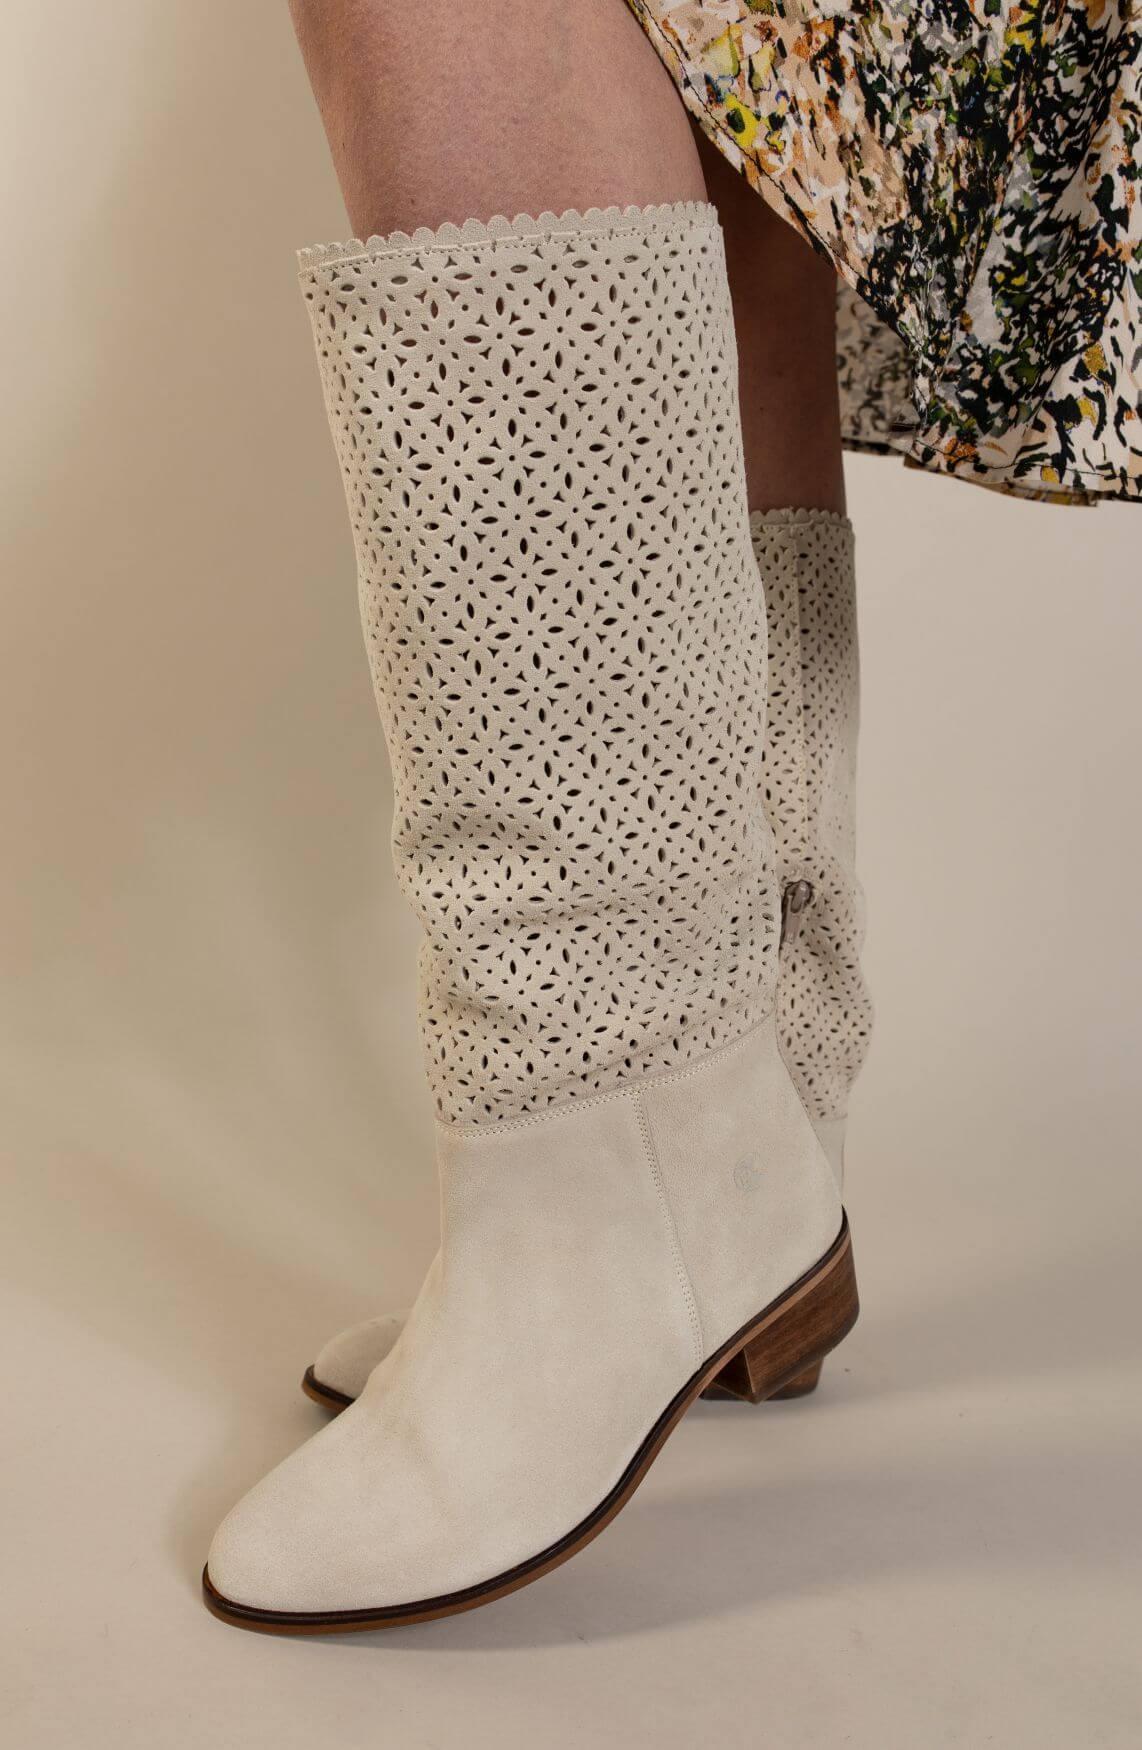 Only a Shoe Dames Cowboylaars Ecru